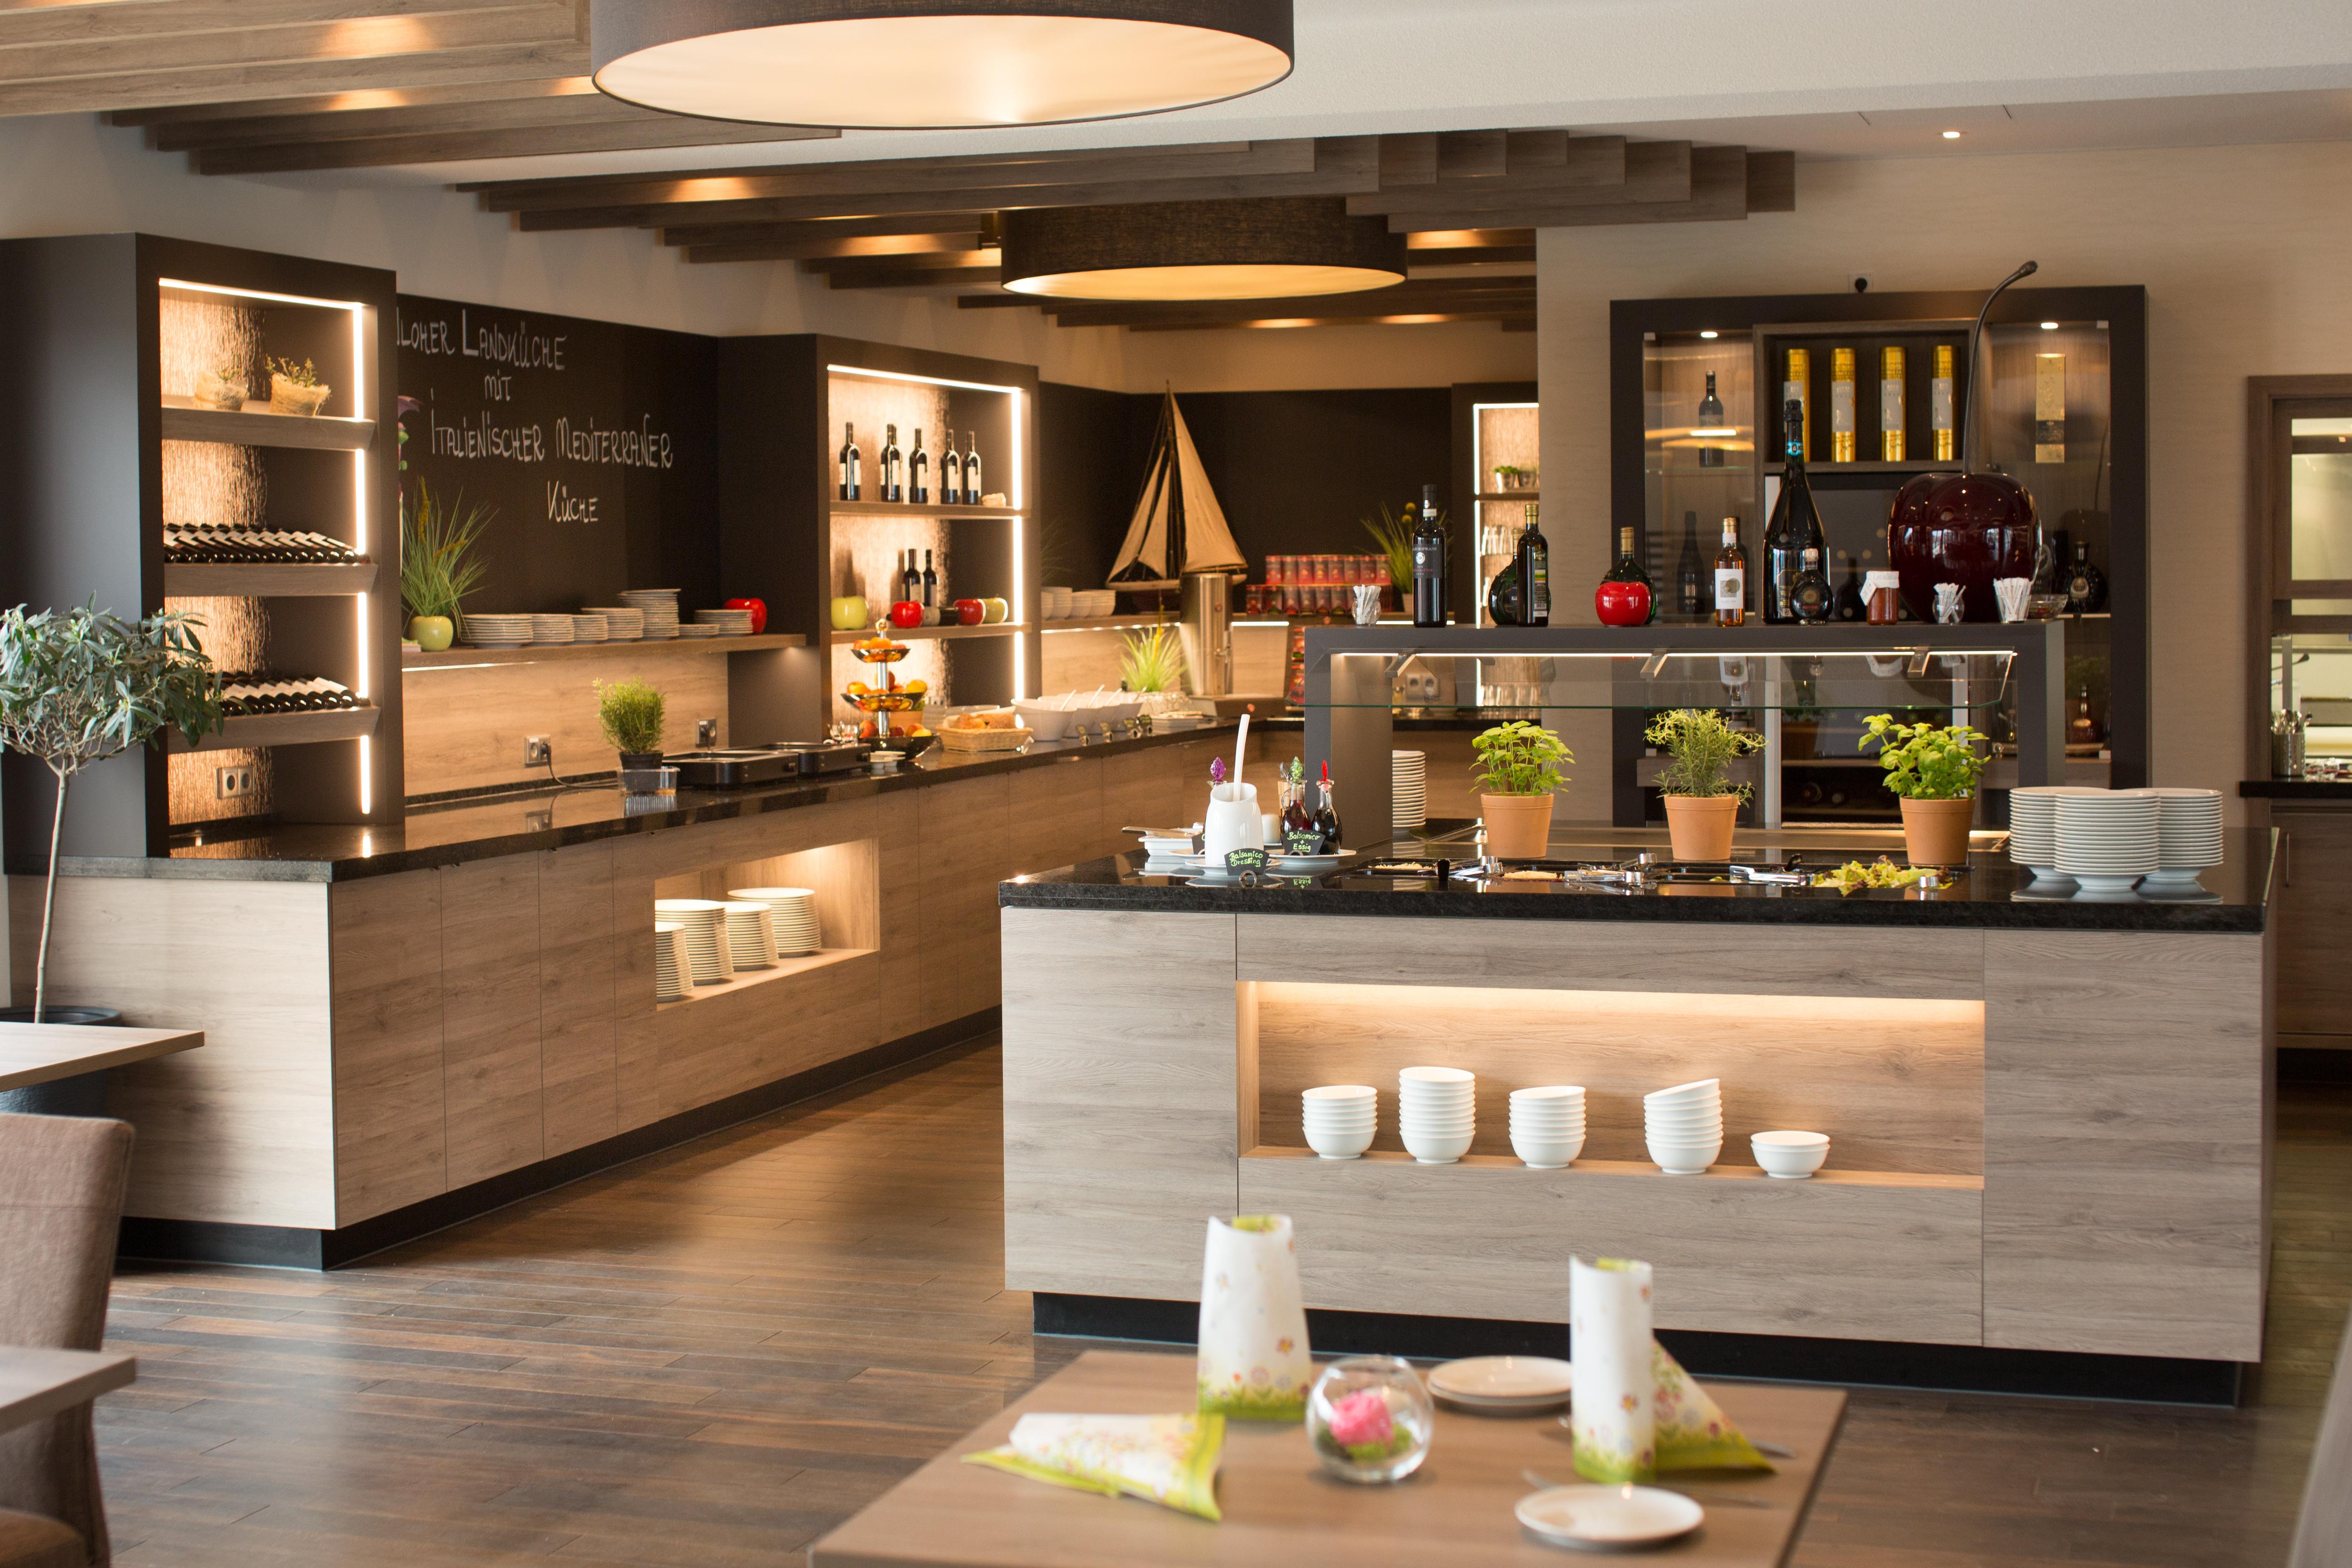 Restaurant-Einrichtung-Buffet